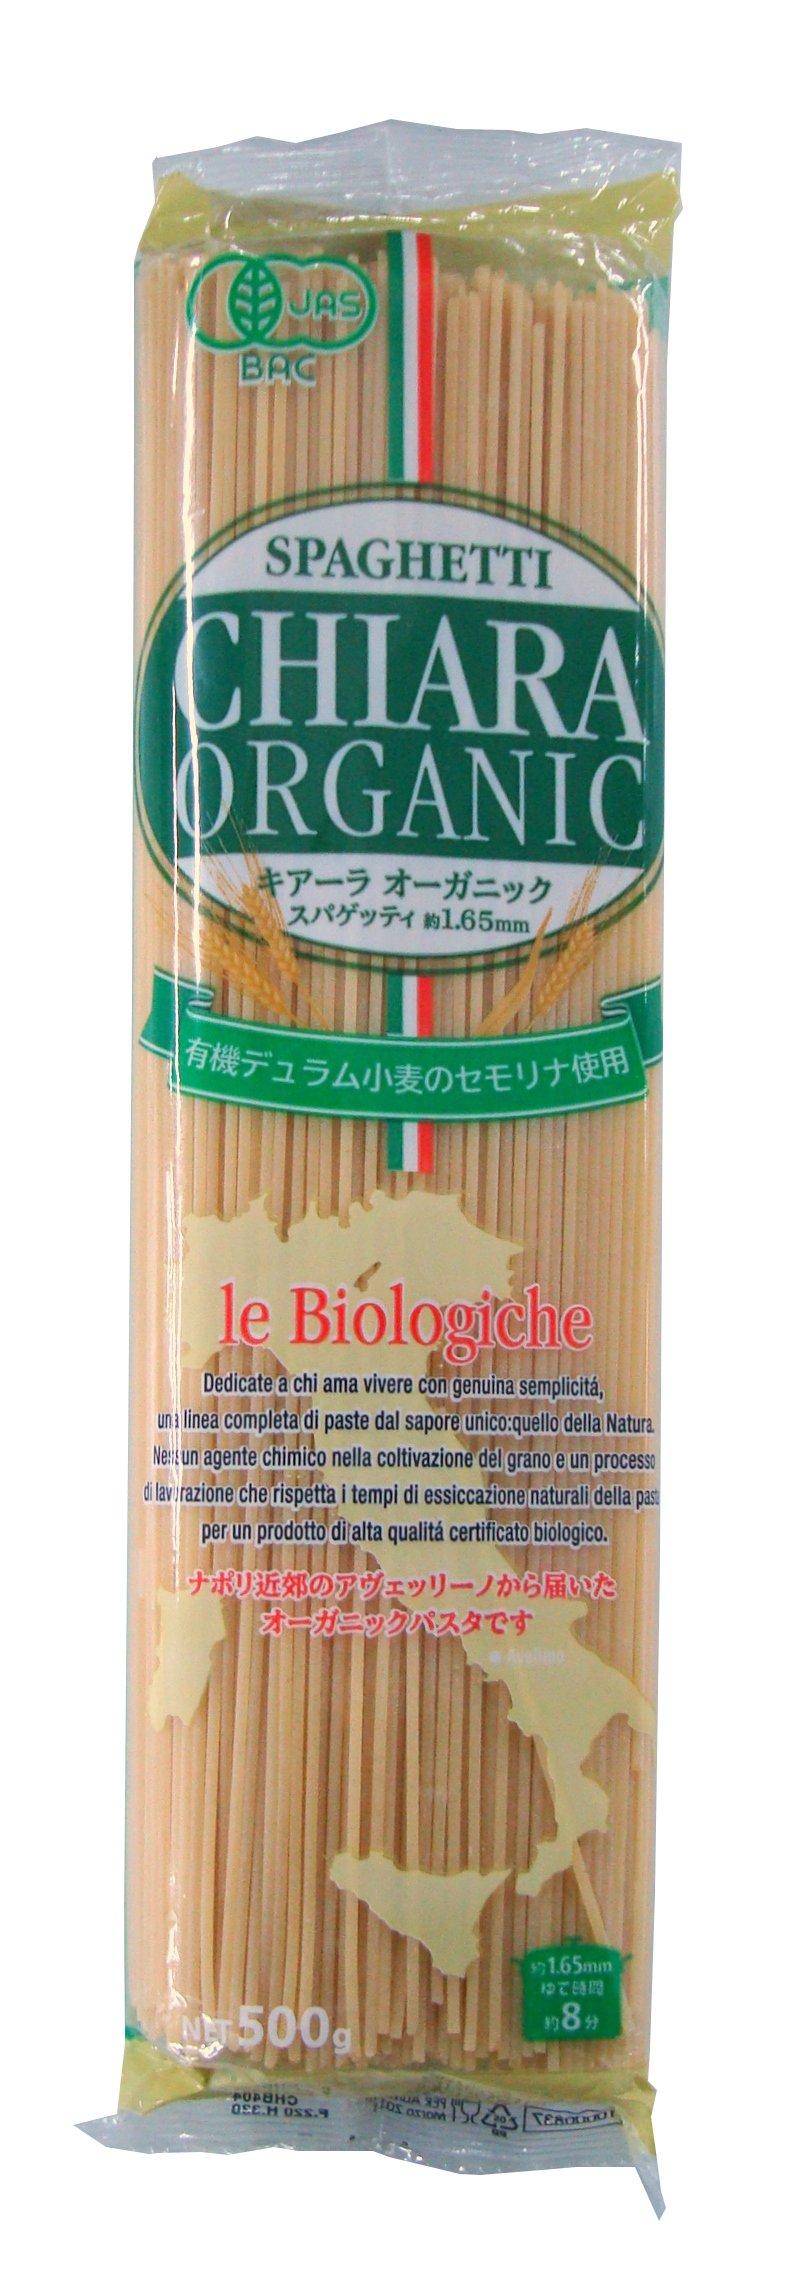 Chiara Organic spaghetti (1.65mm) 500gX24 pieces